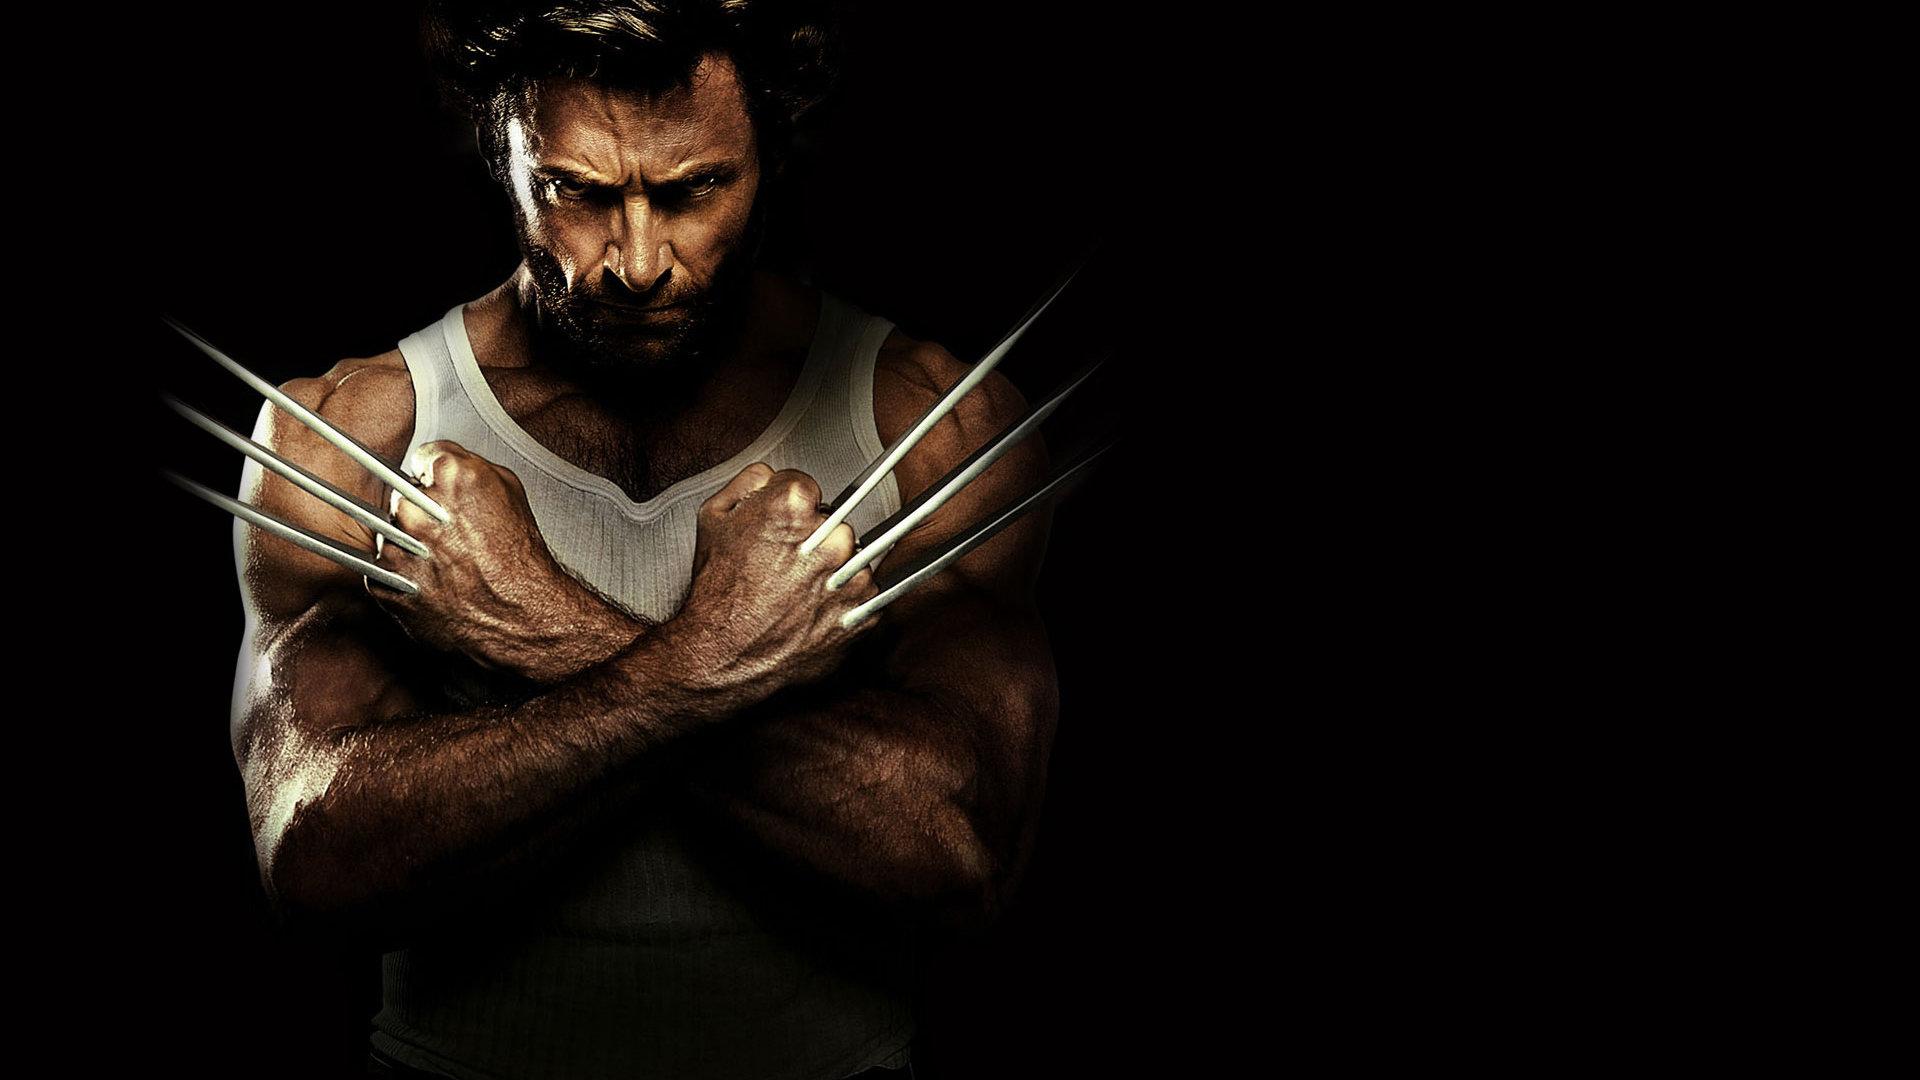 X Men Origins Wolverine Wallpapers Hd For Desktop Backgrounds